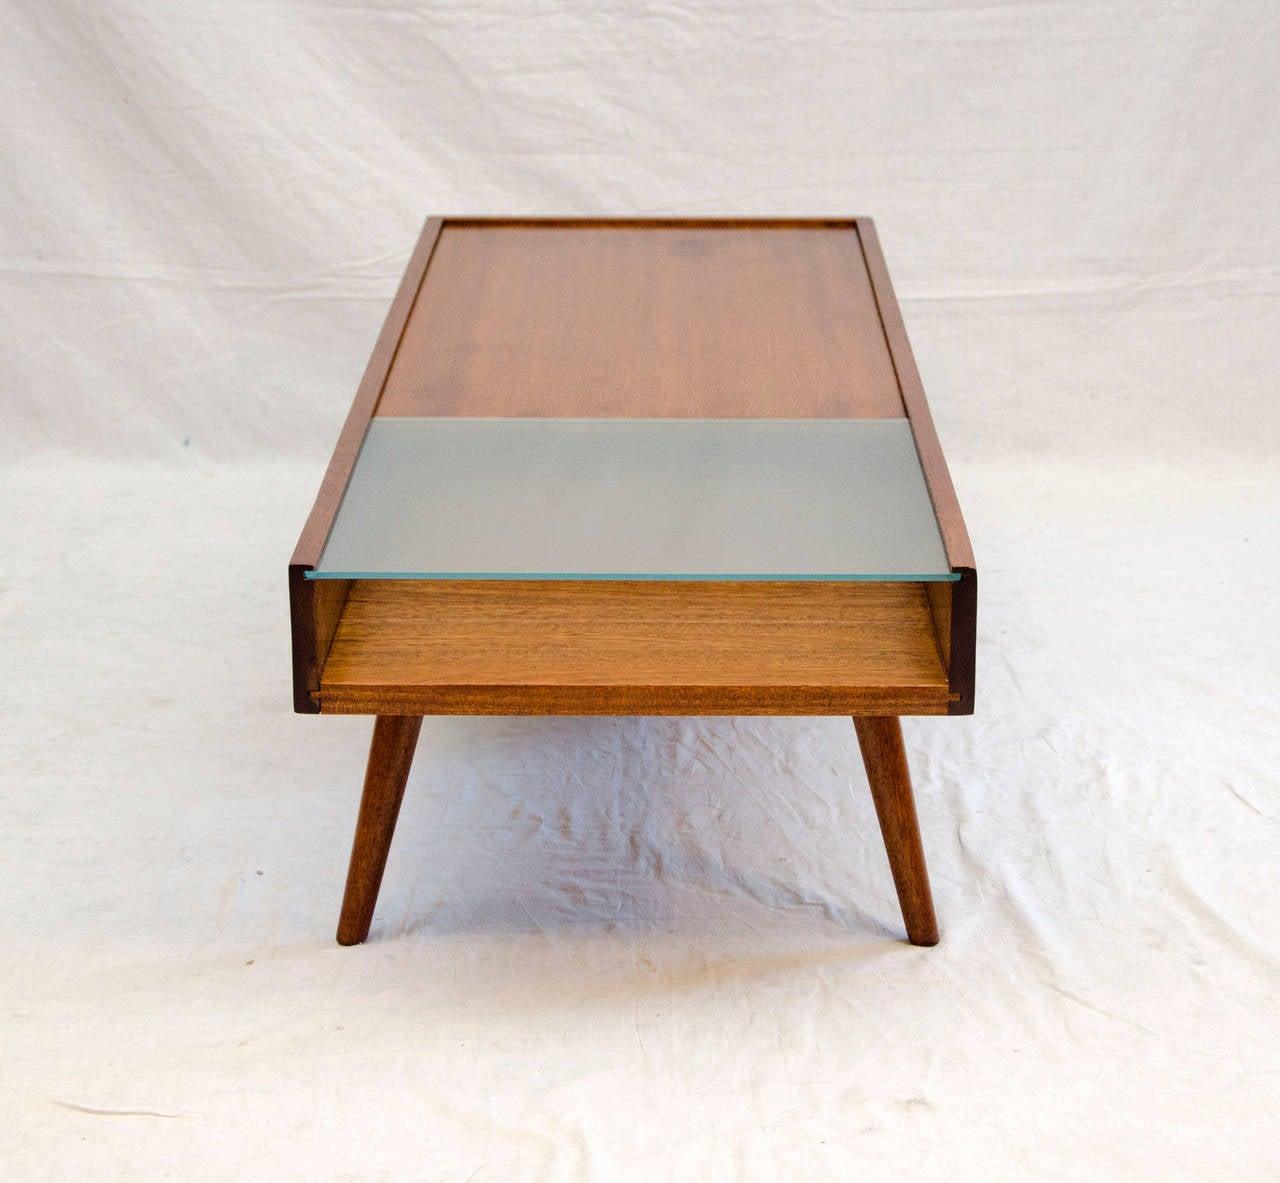 Mid Century Coffee Table John Keal For Brown Saltman At: Mid-Century Coffee Table, John Keal For Brown Saltman At